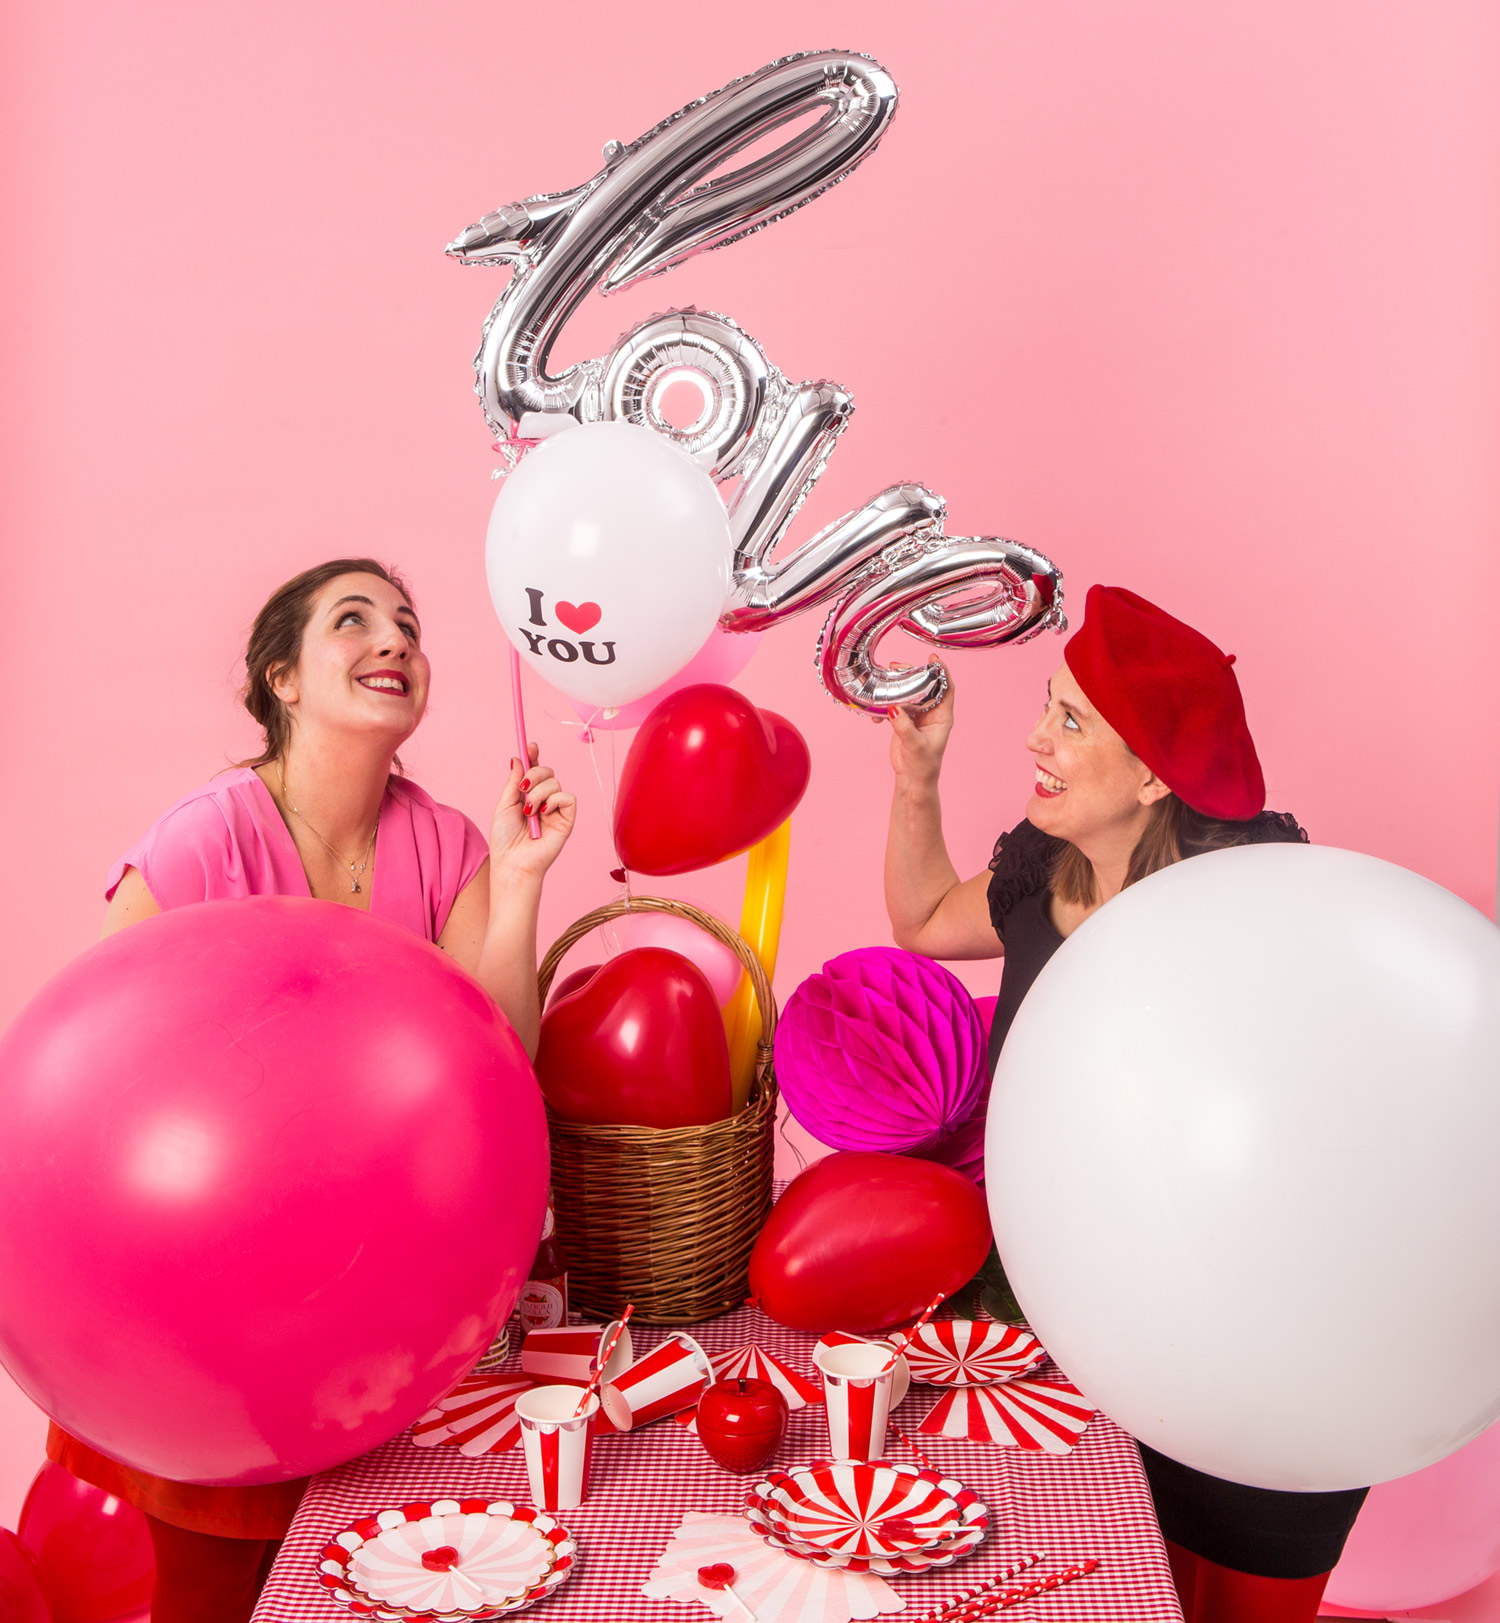 love-balloons-collection_2.jpg